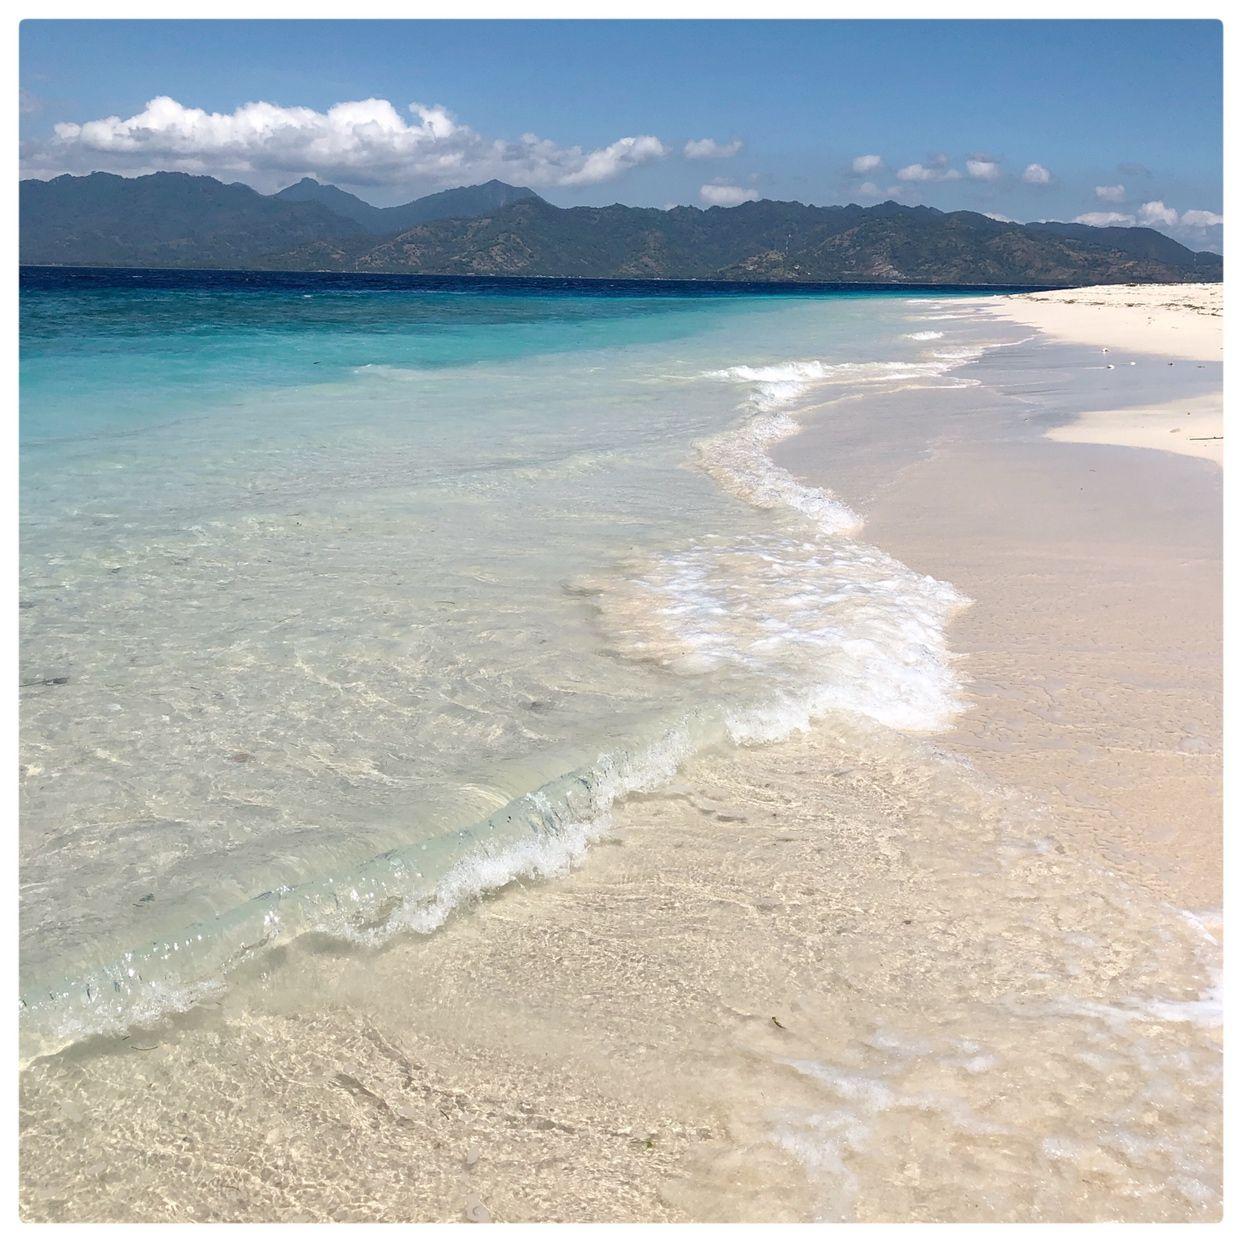 Splashing into mid week with some Indonesian saltiness at Gili Meno  #beach #nature #sea #love #summer #water #beautiful #beachlife #adventure #sun #beauty #explore #island #relax #vitaminsea #calm #splashofsalt